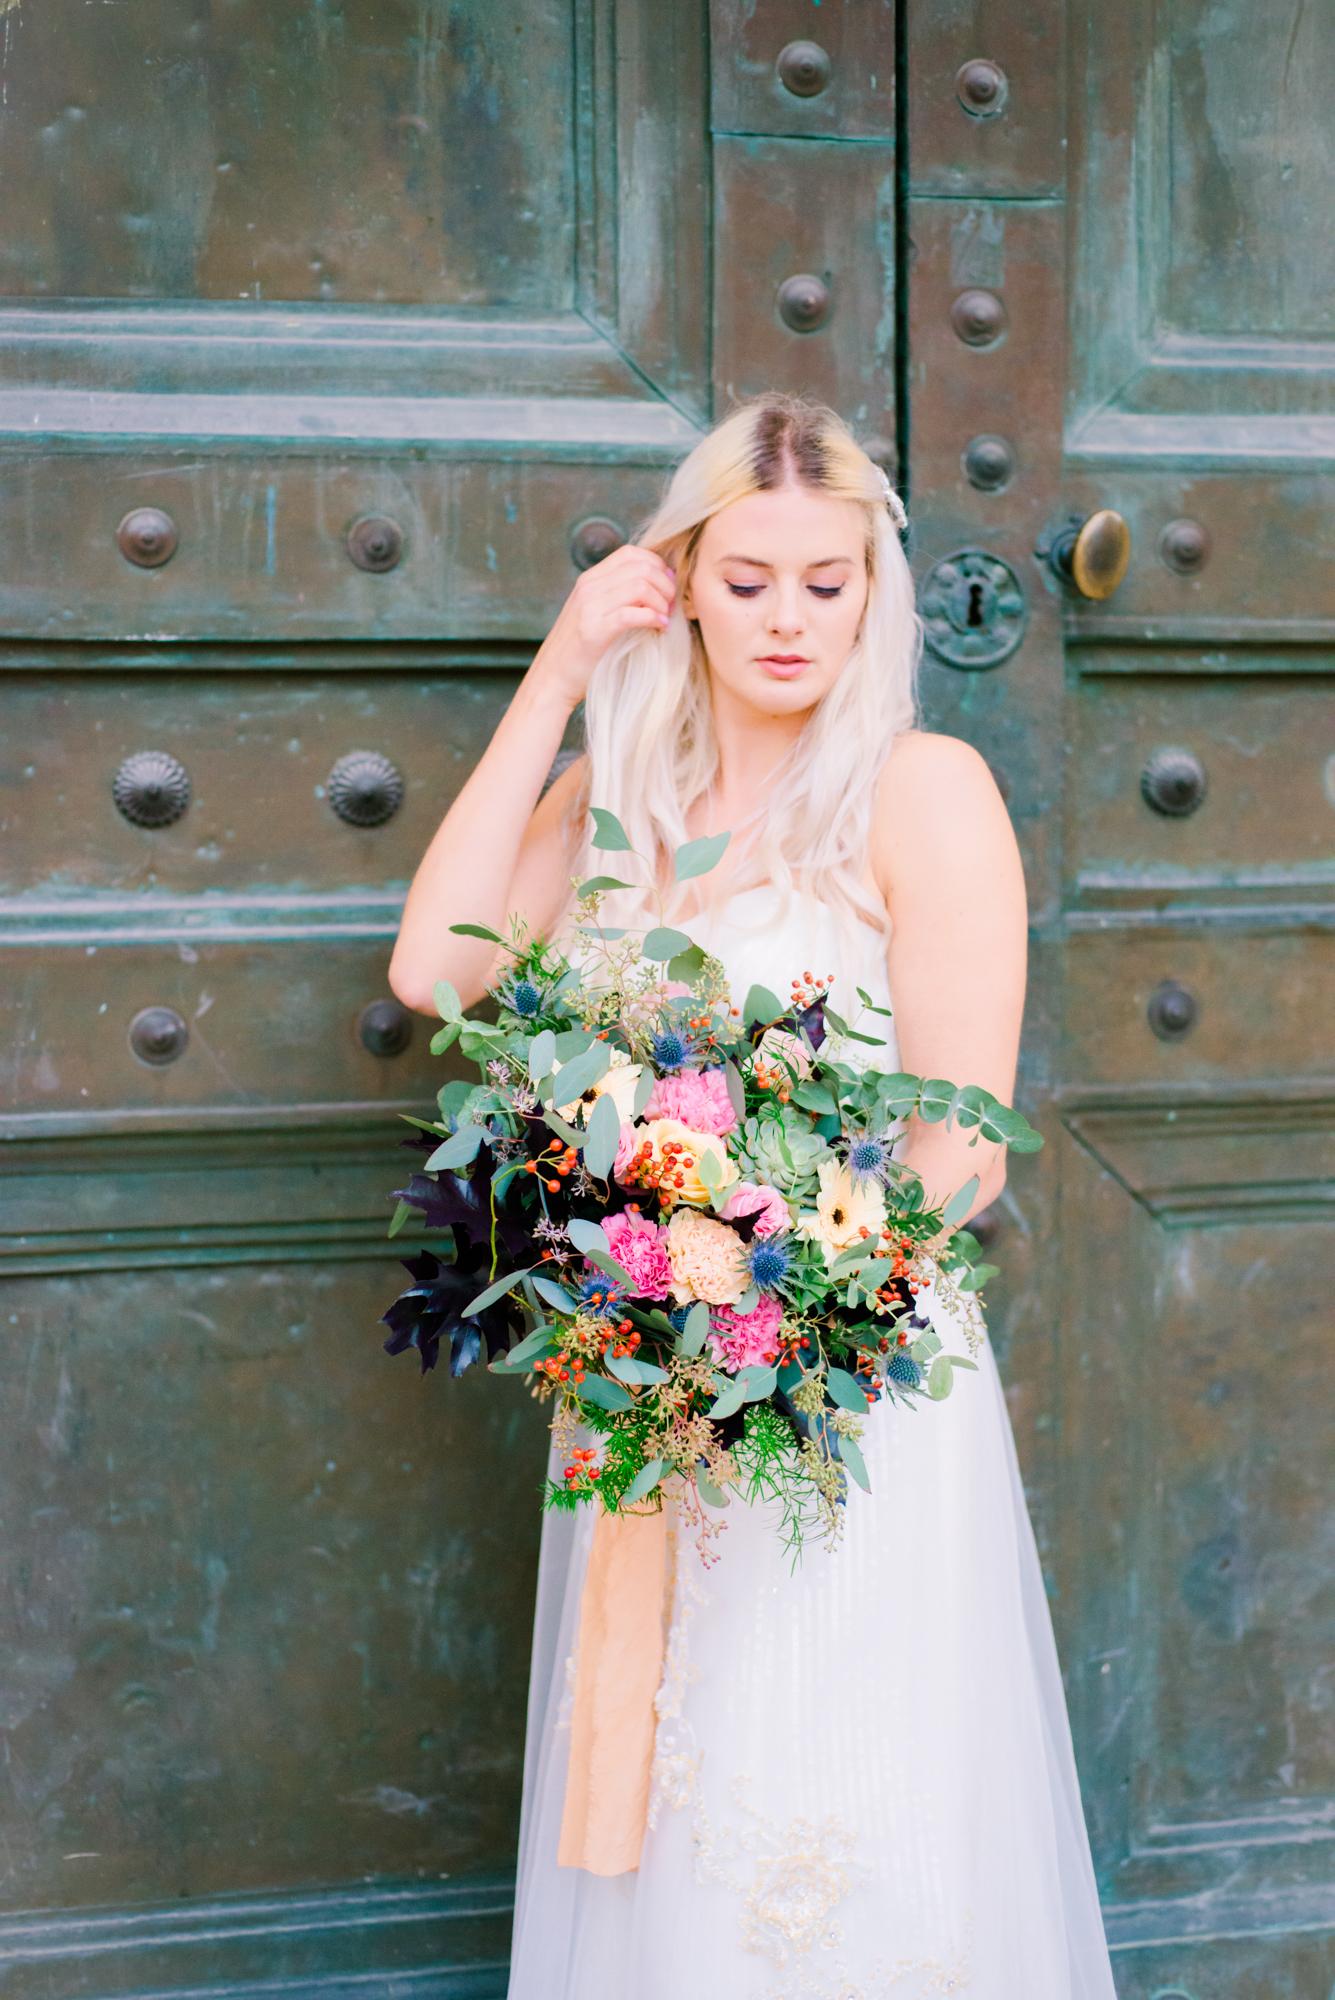 Elegant Organic Fall Swedish Bridal Wedding Styled Shoot - Erika Alvarenga Photography-41.jpg